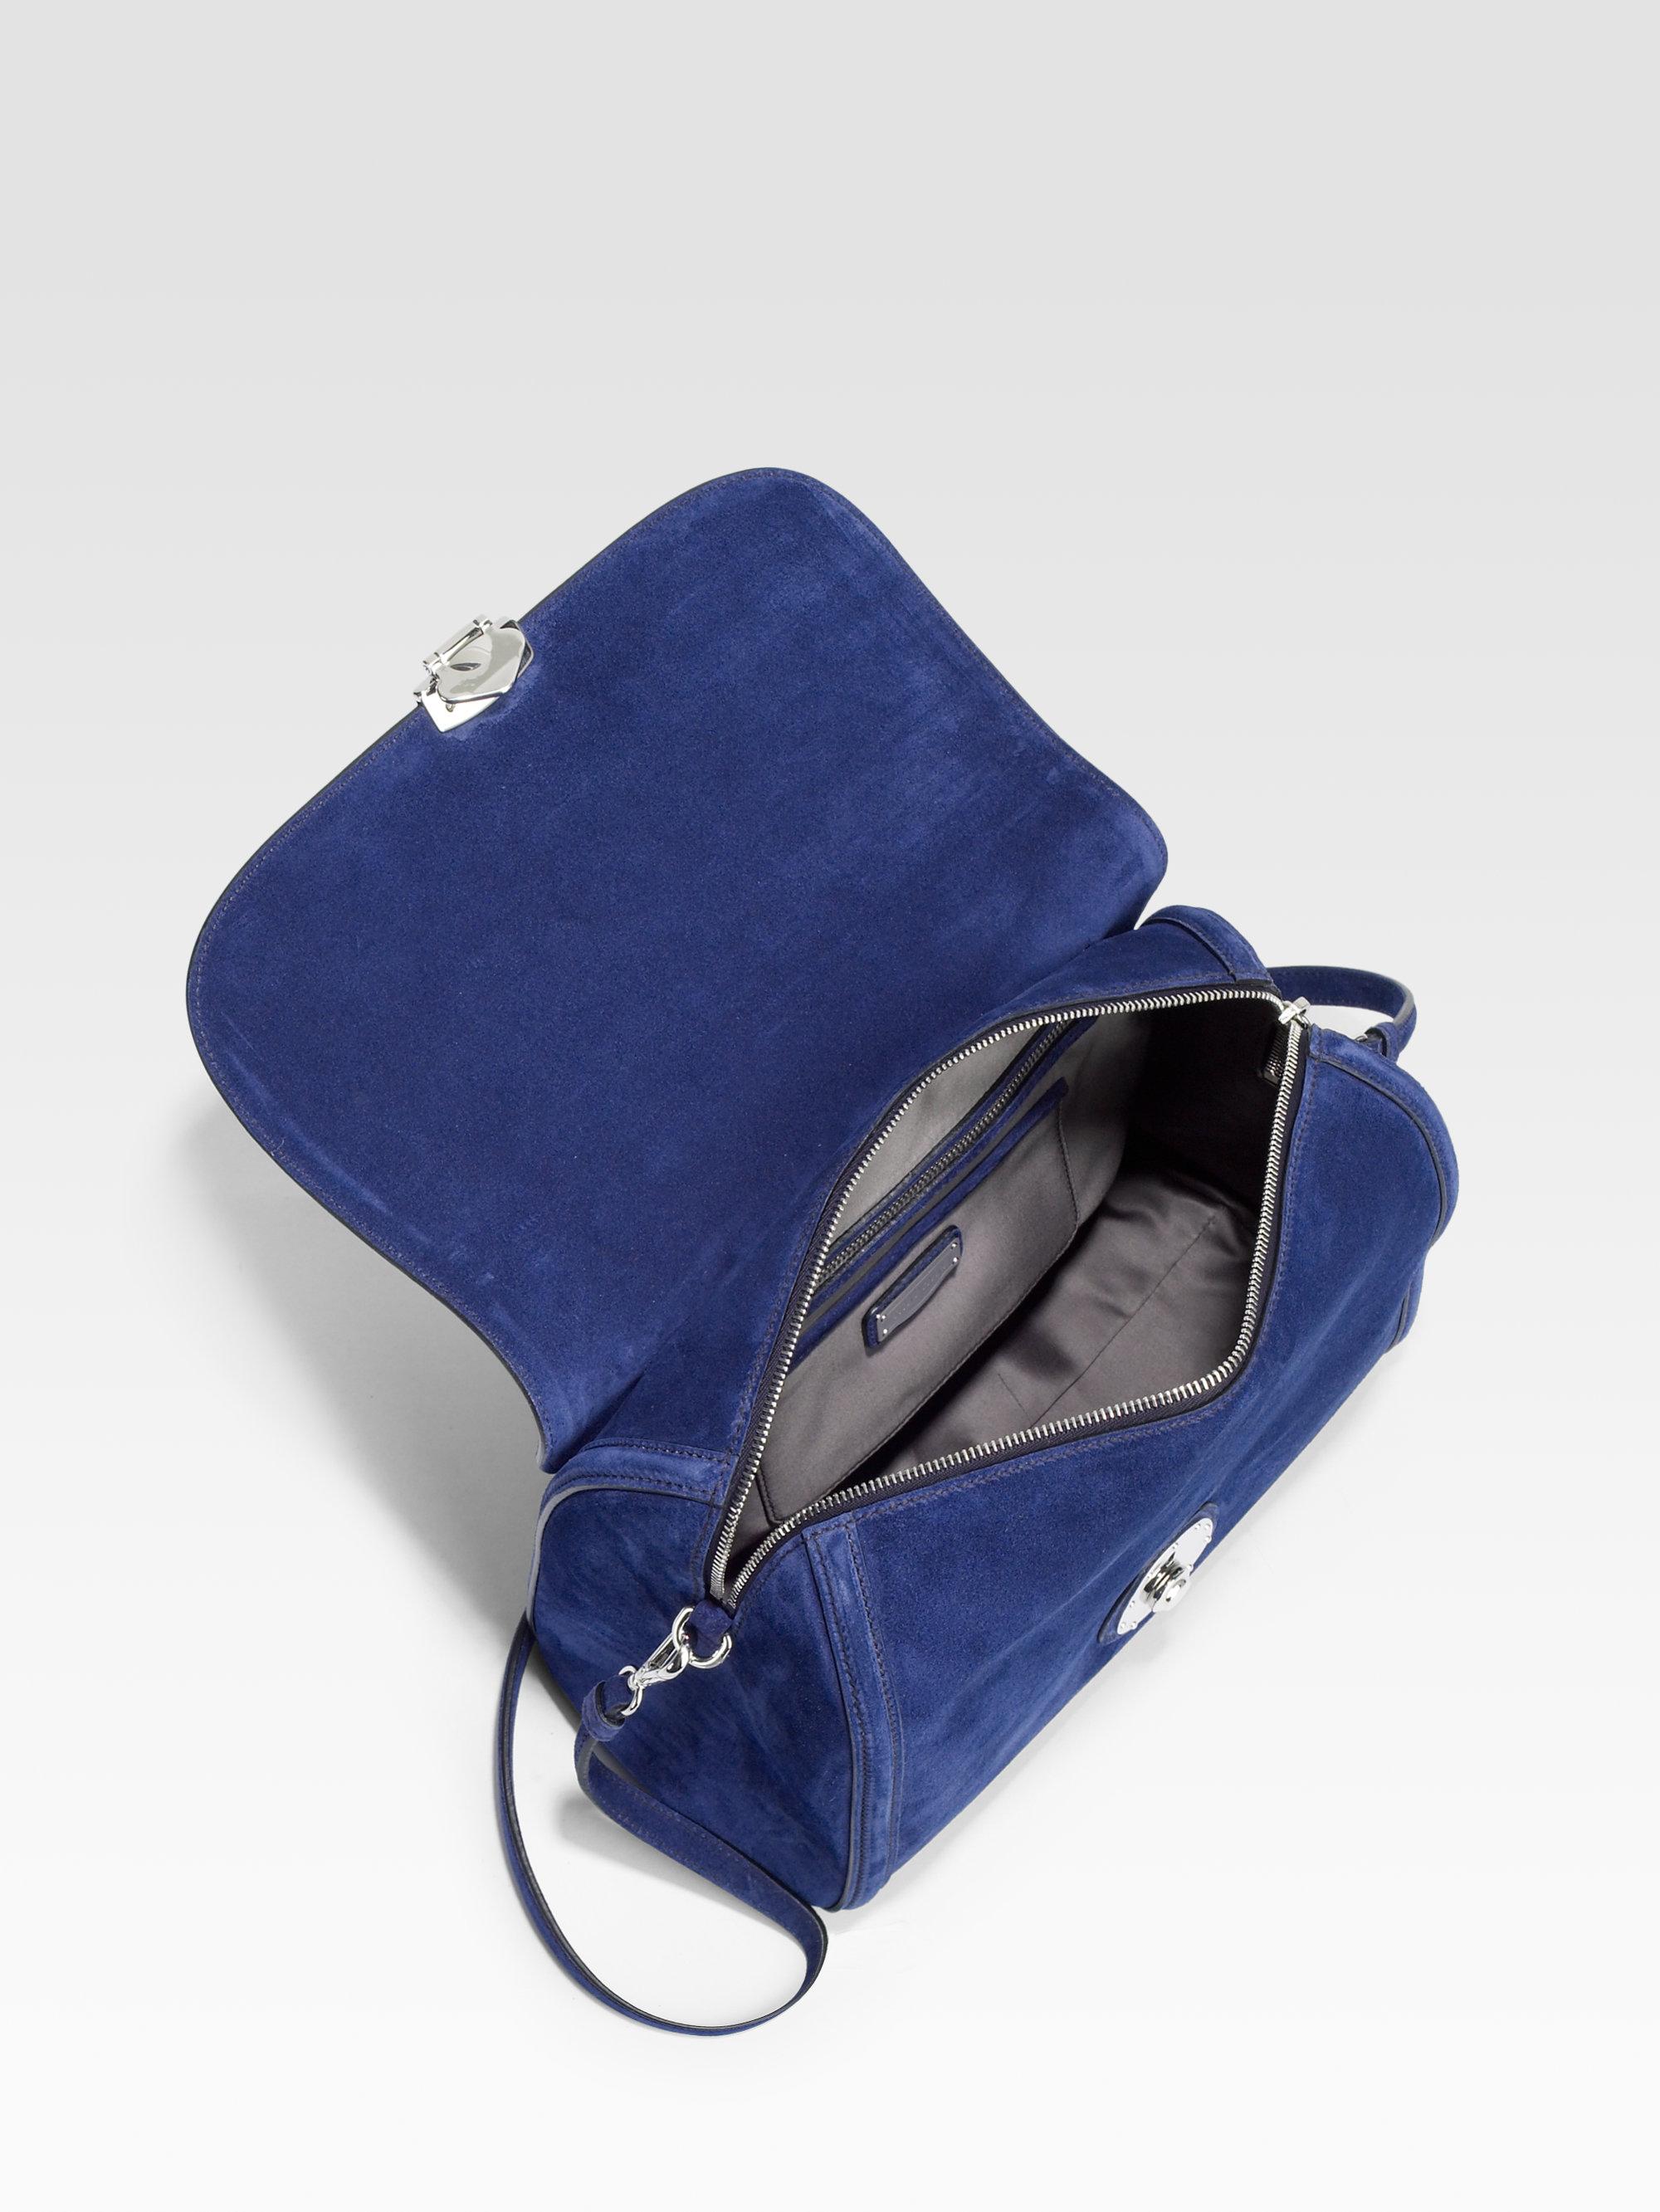 Miu Miu Navy Handbag